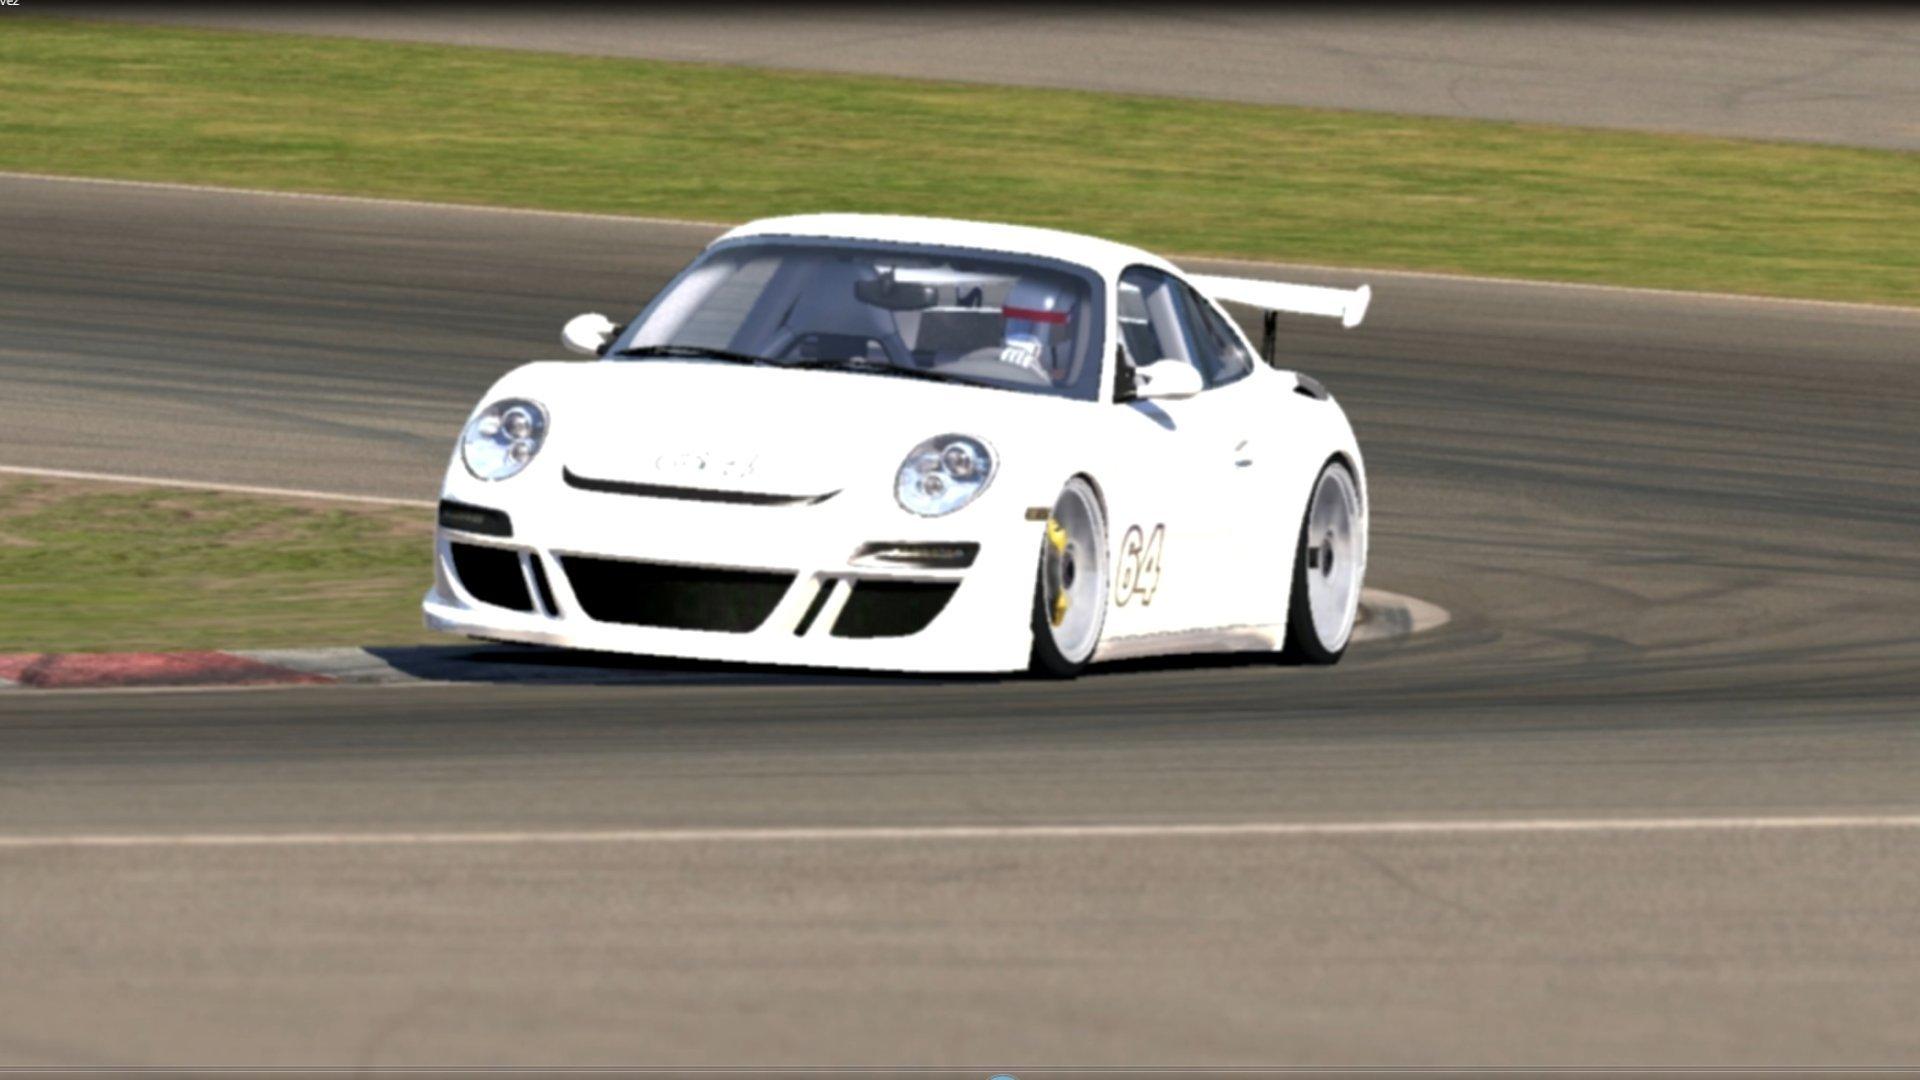 iRacing RUF Test Drive at Daytona and California with Thrustmaster Wheel